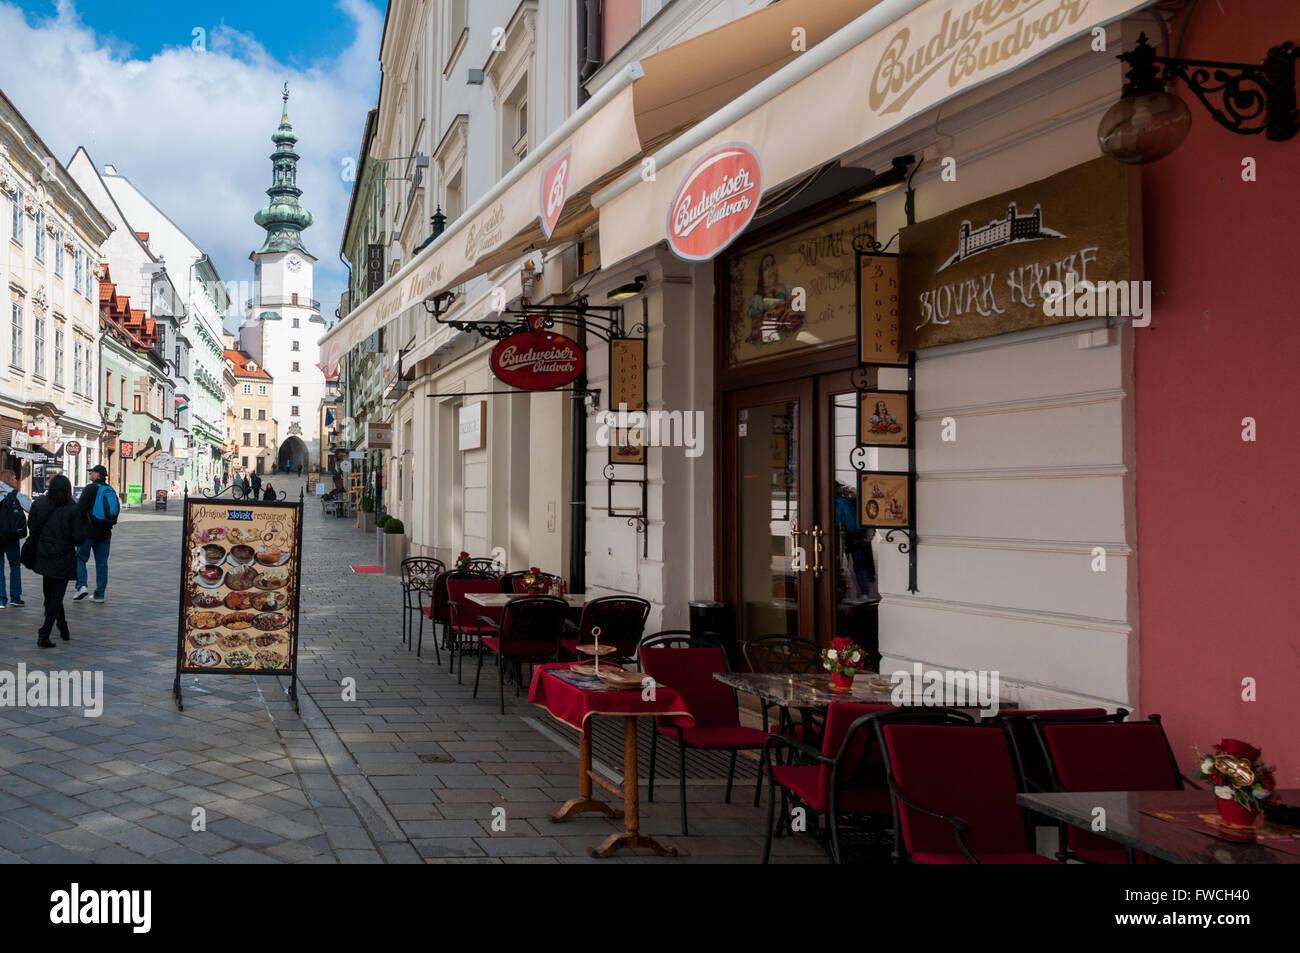 michaels-gate-bratislava-slovakia-FWCH40